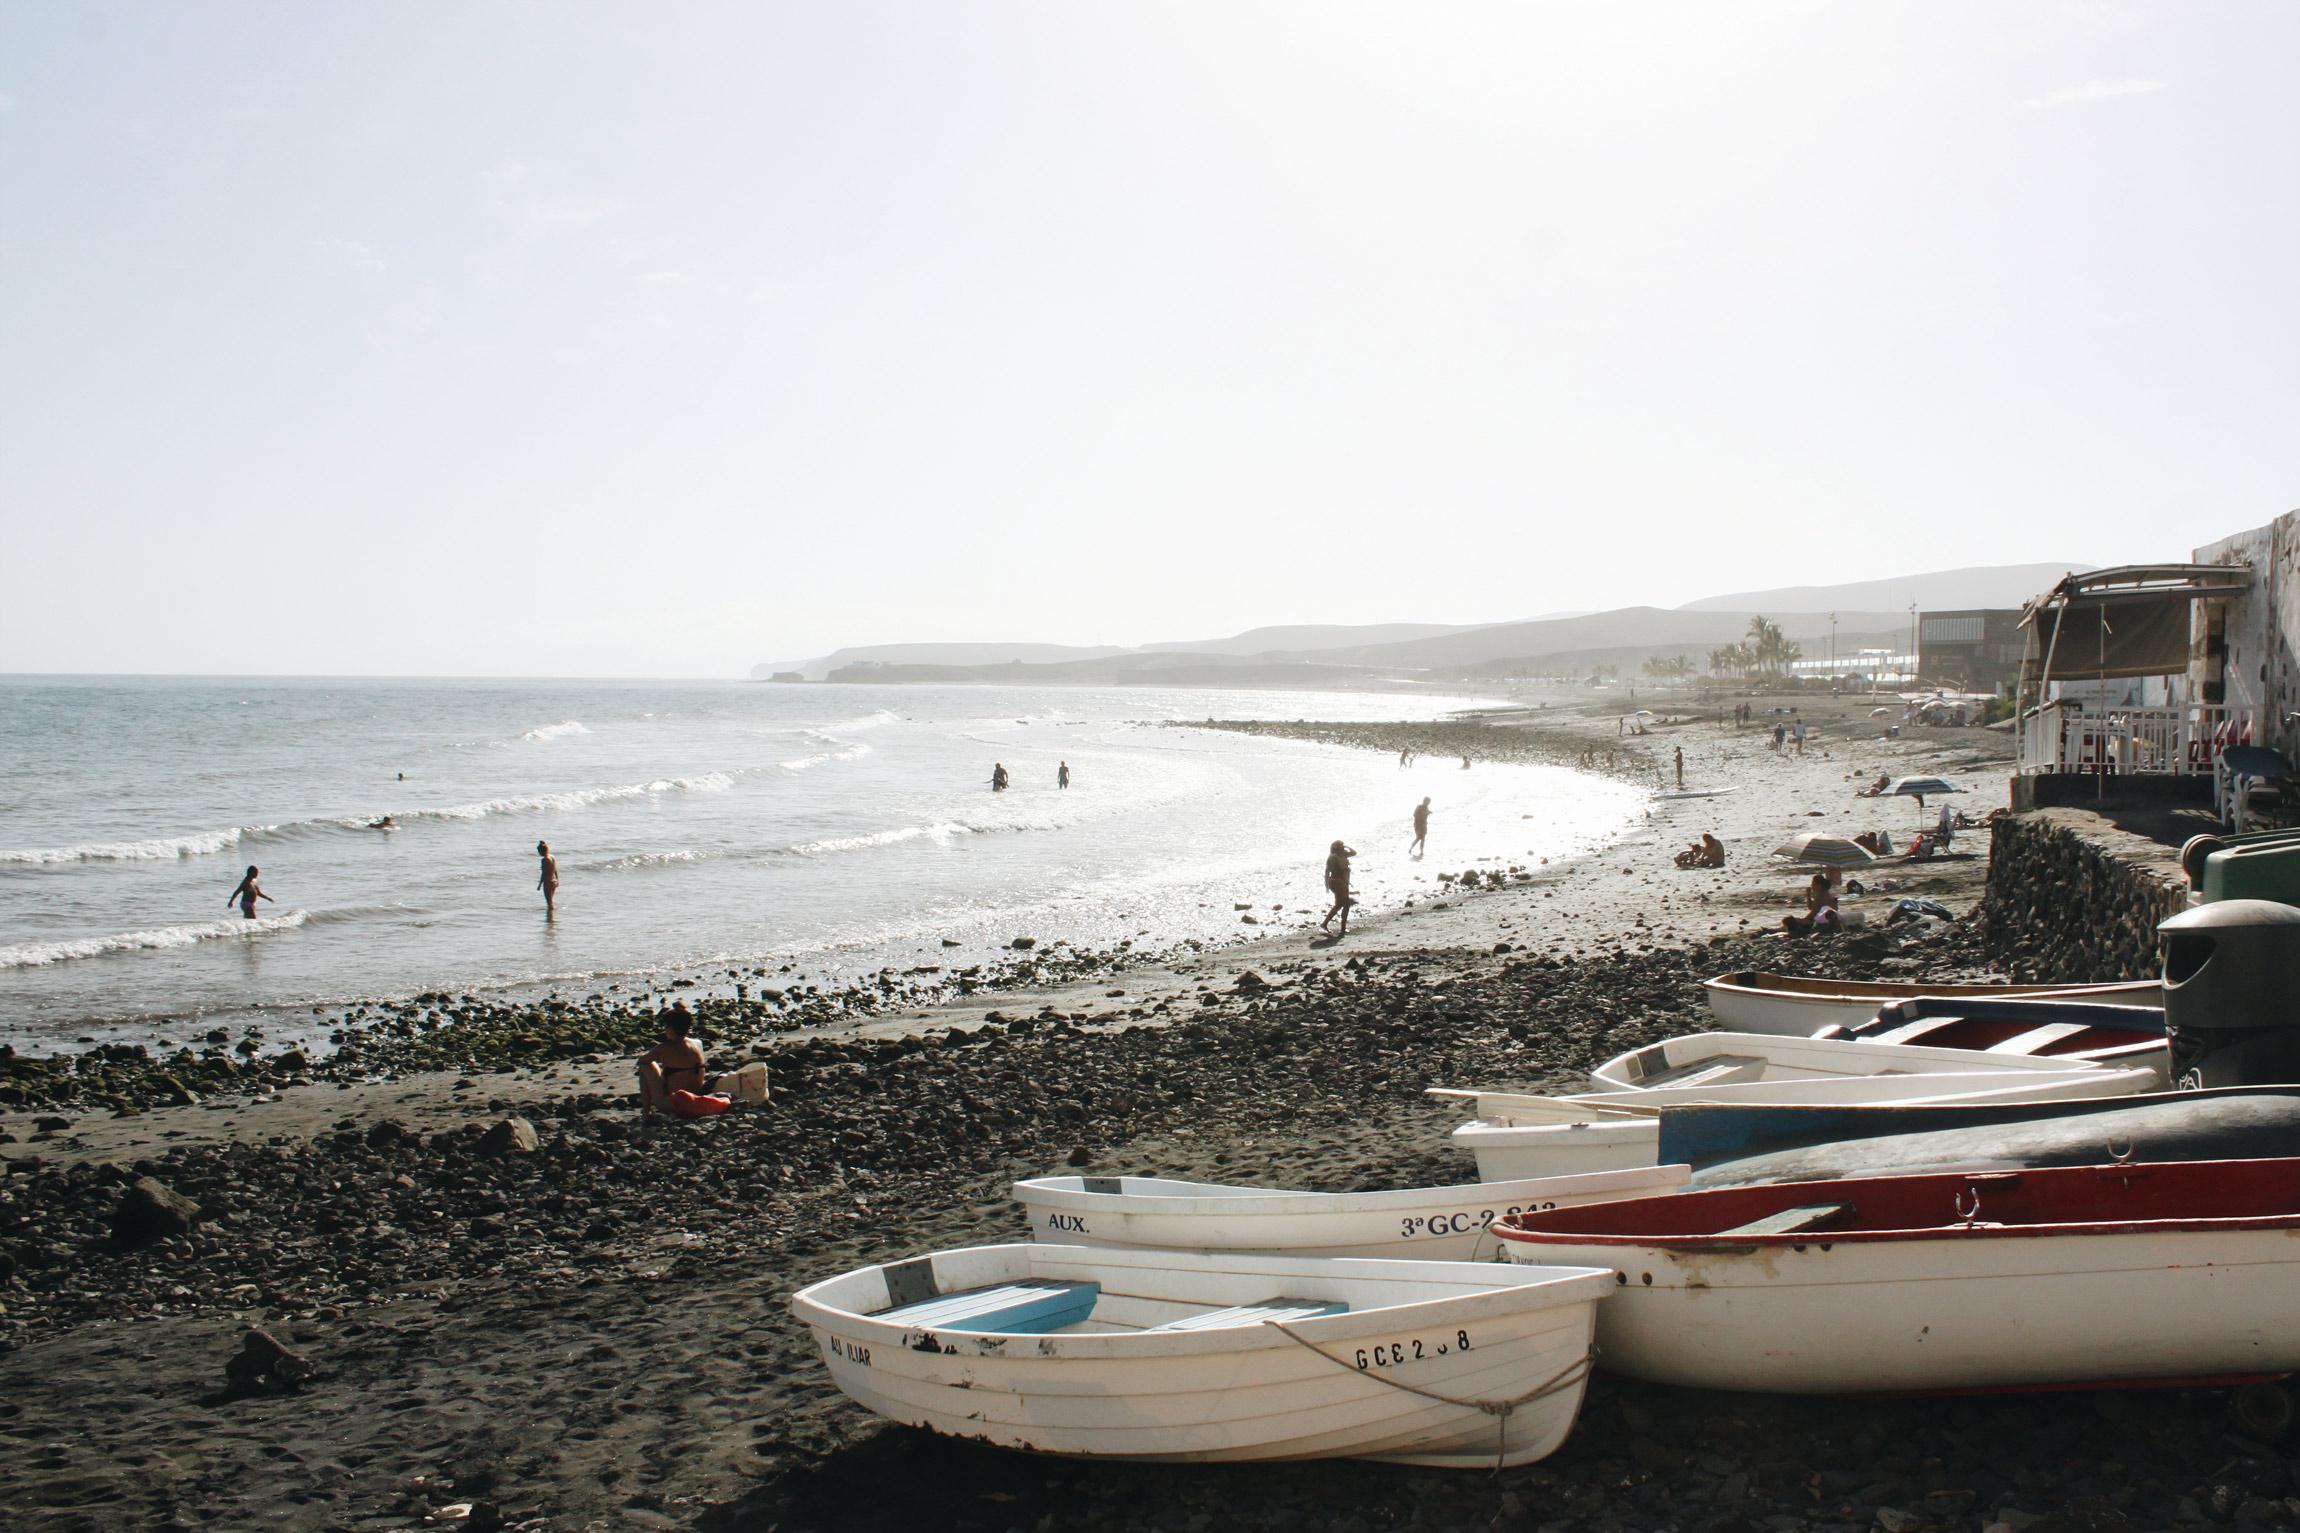 Surfing in Fuerteventura - Canary islands, Spain